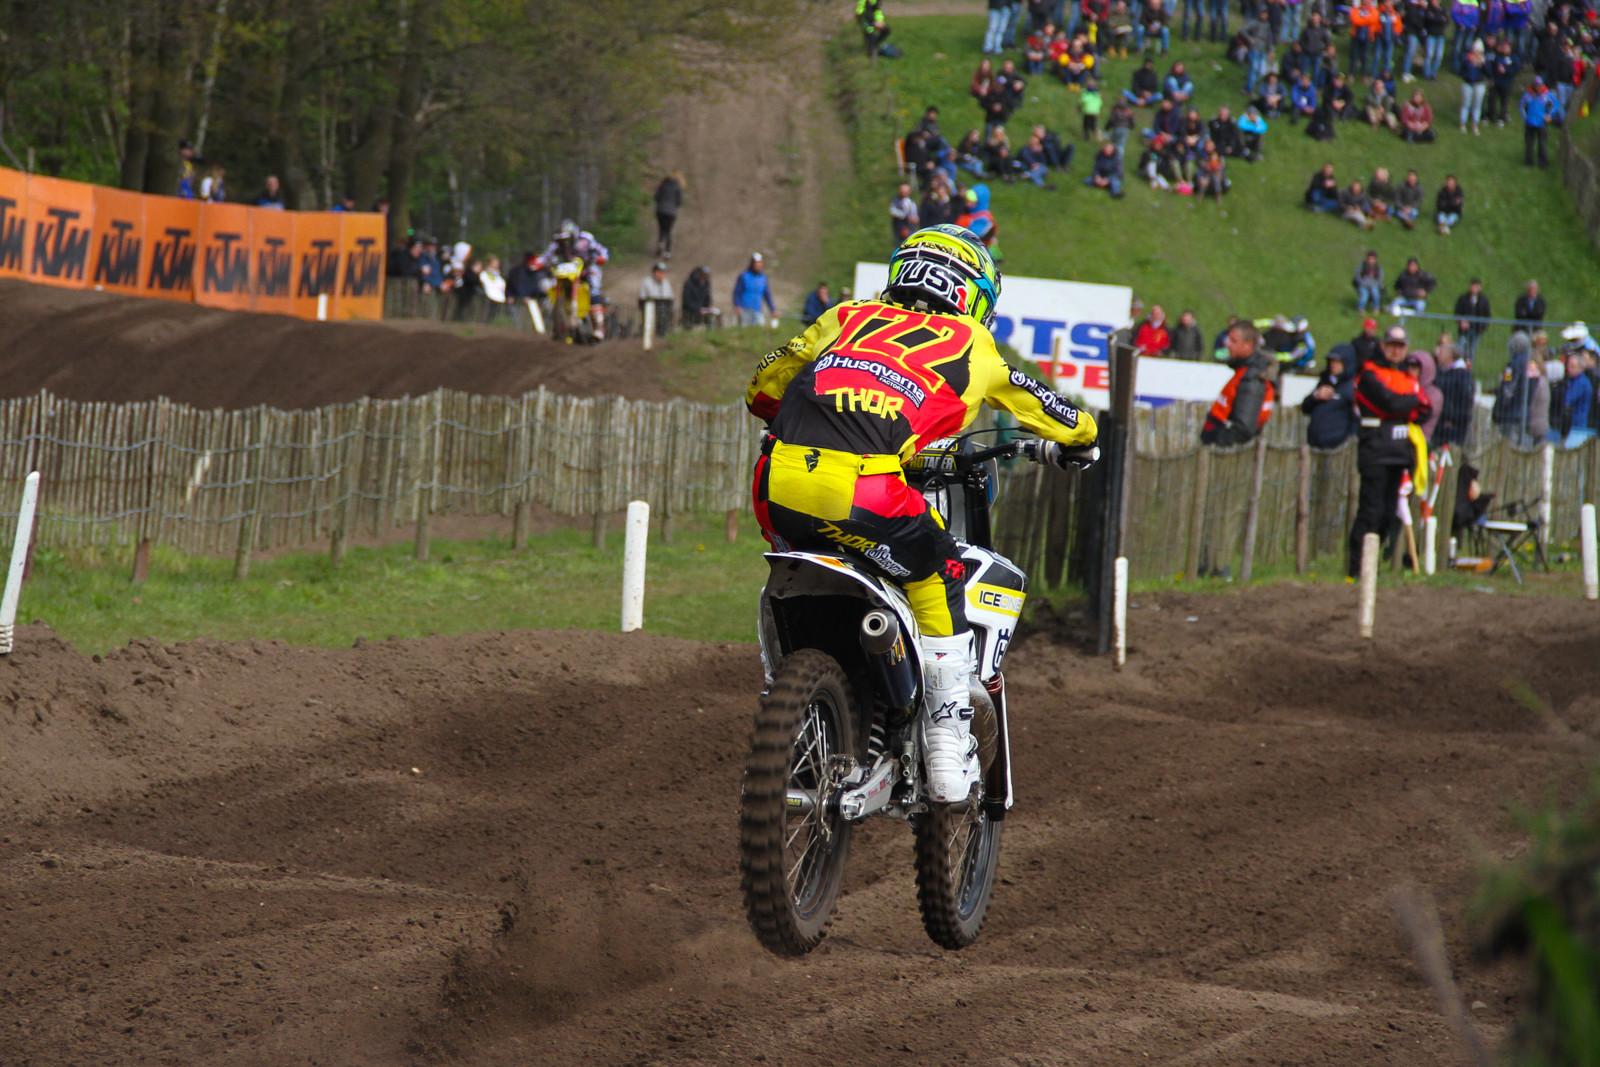 Mikkel Haaurp - Photo Blast: 2017 MXGP of Valkenswaard - Motocross Pictures - Vital MX